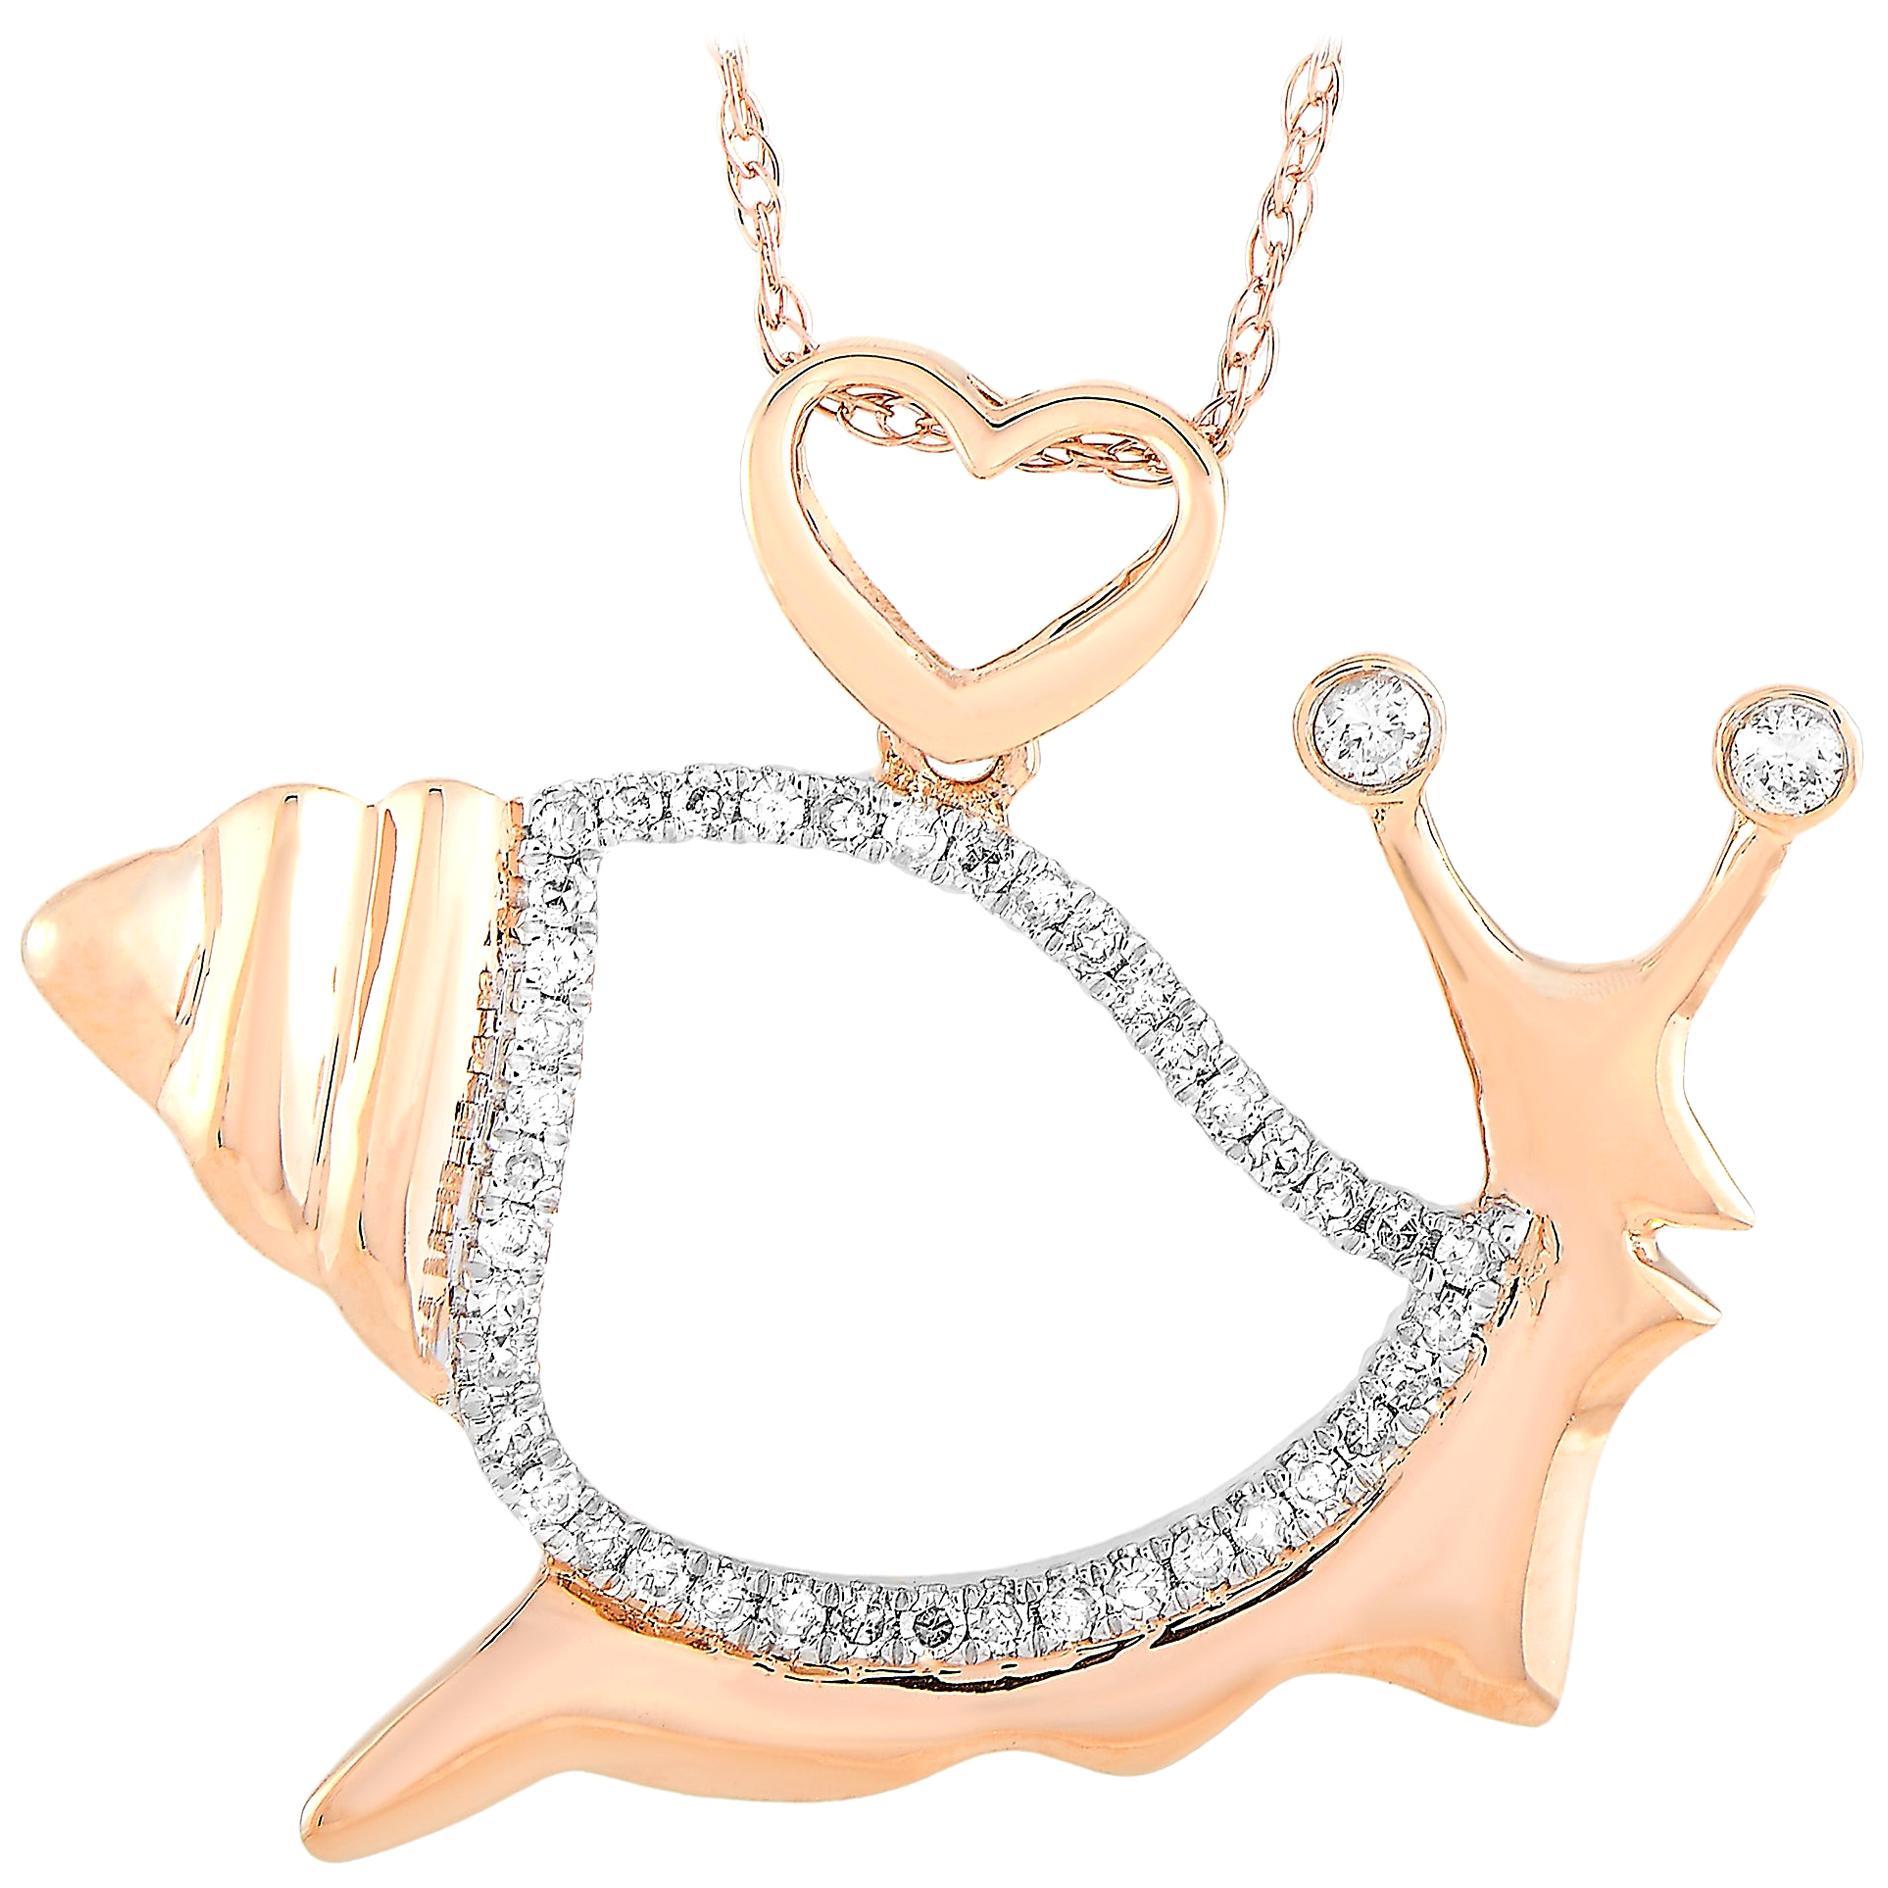 LB Exclusive 14 Karat Rose Gold 0.16 Carat Diamond Snail Pendant Necklace